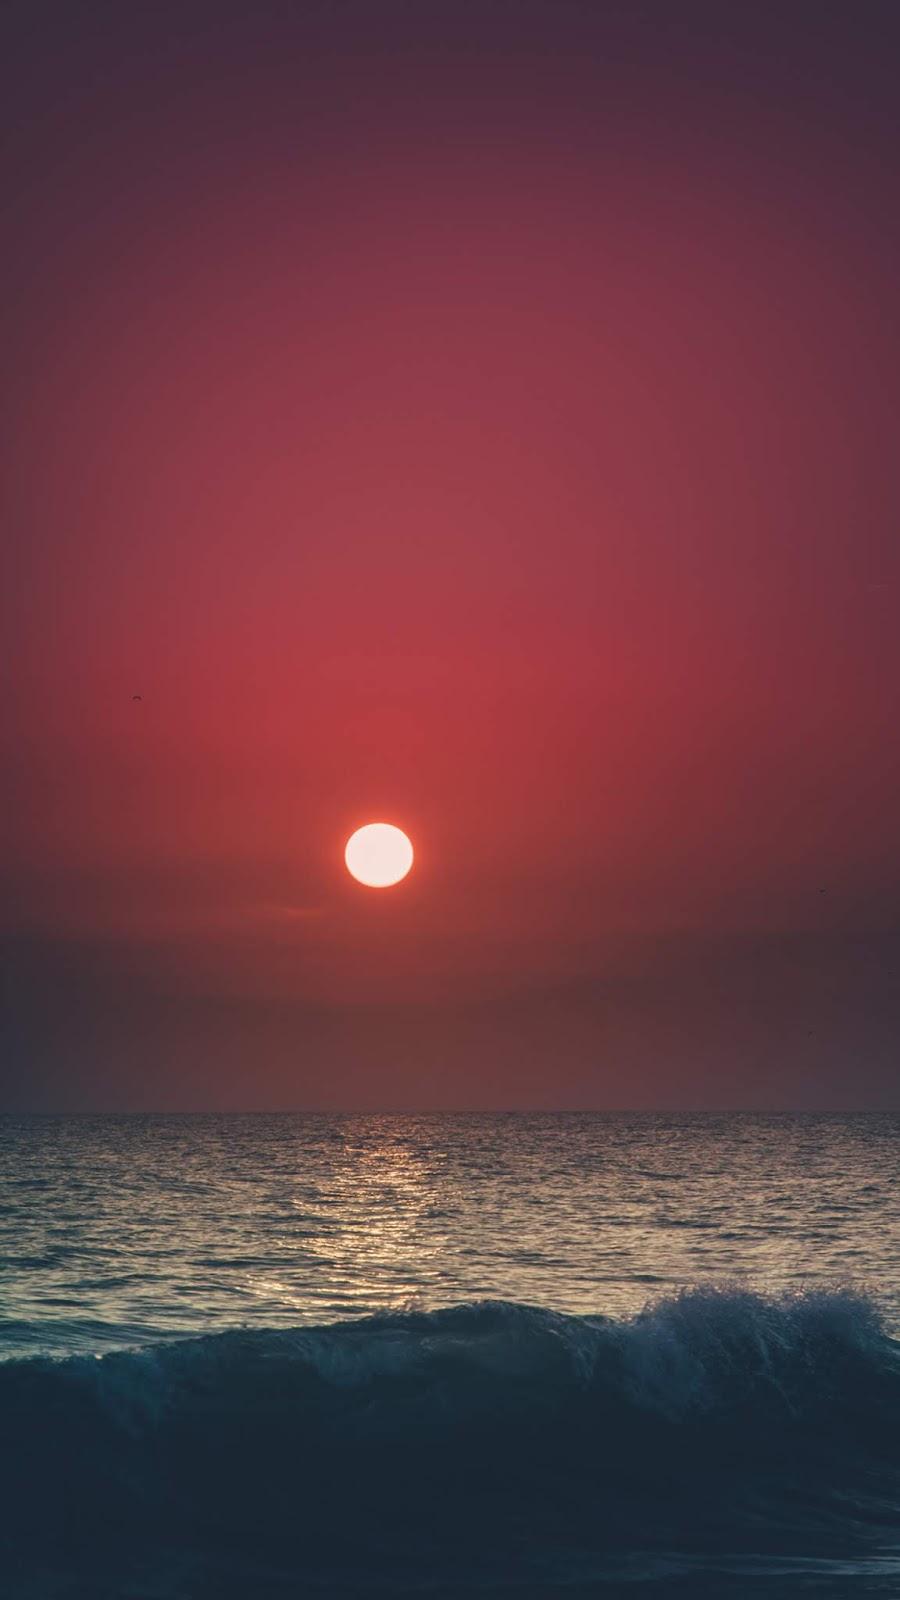 Beach in the sunset wallpaper